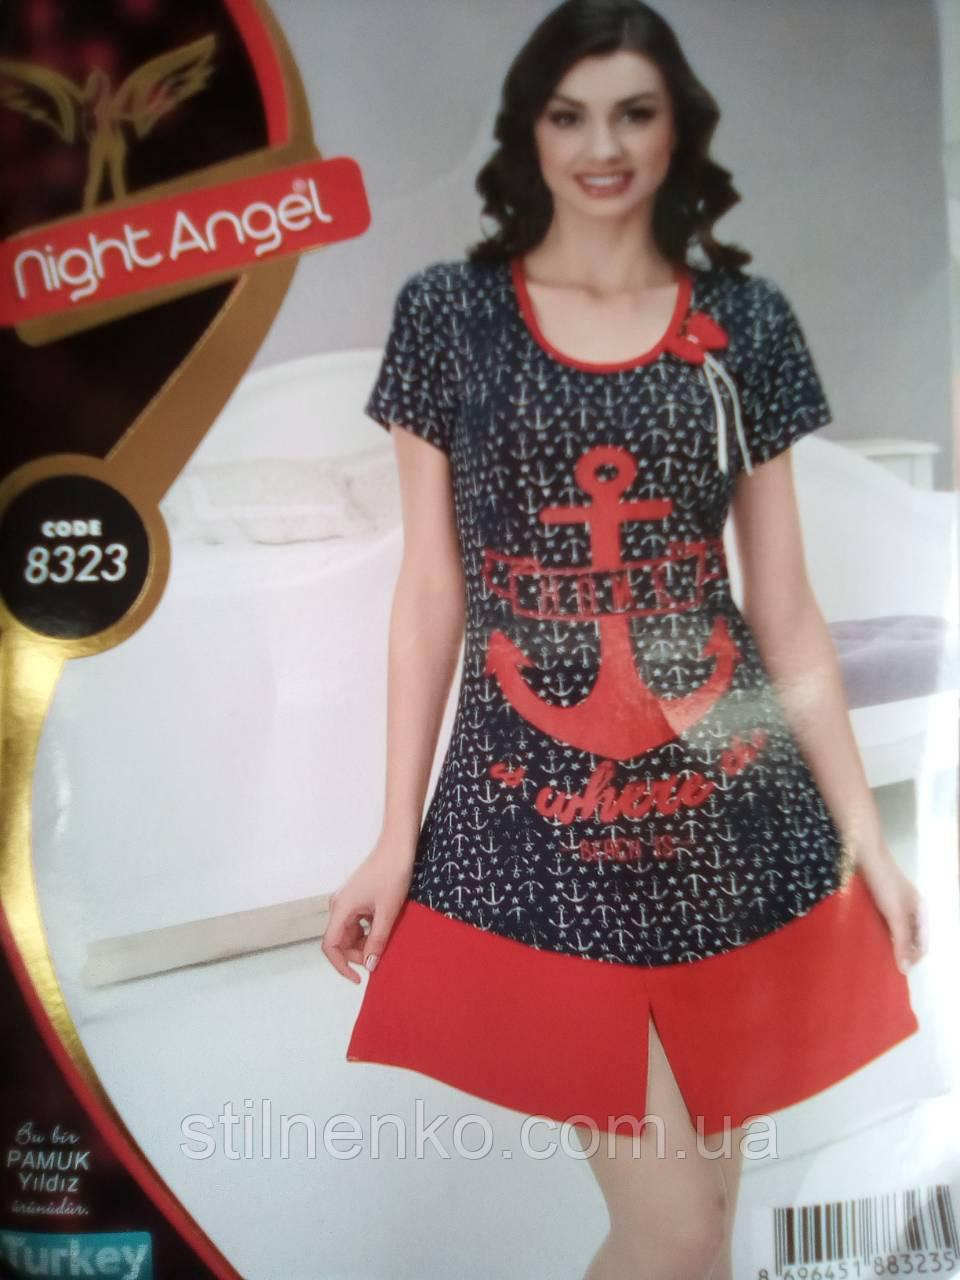 3fea6a4037ea46e Платье женское производство Турция размер M/L Night Angel: продажа ...